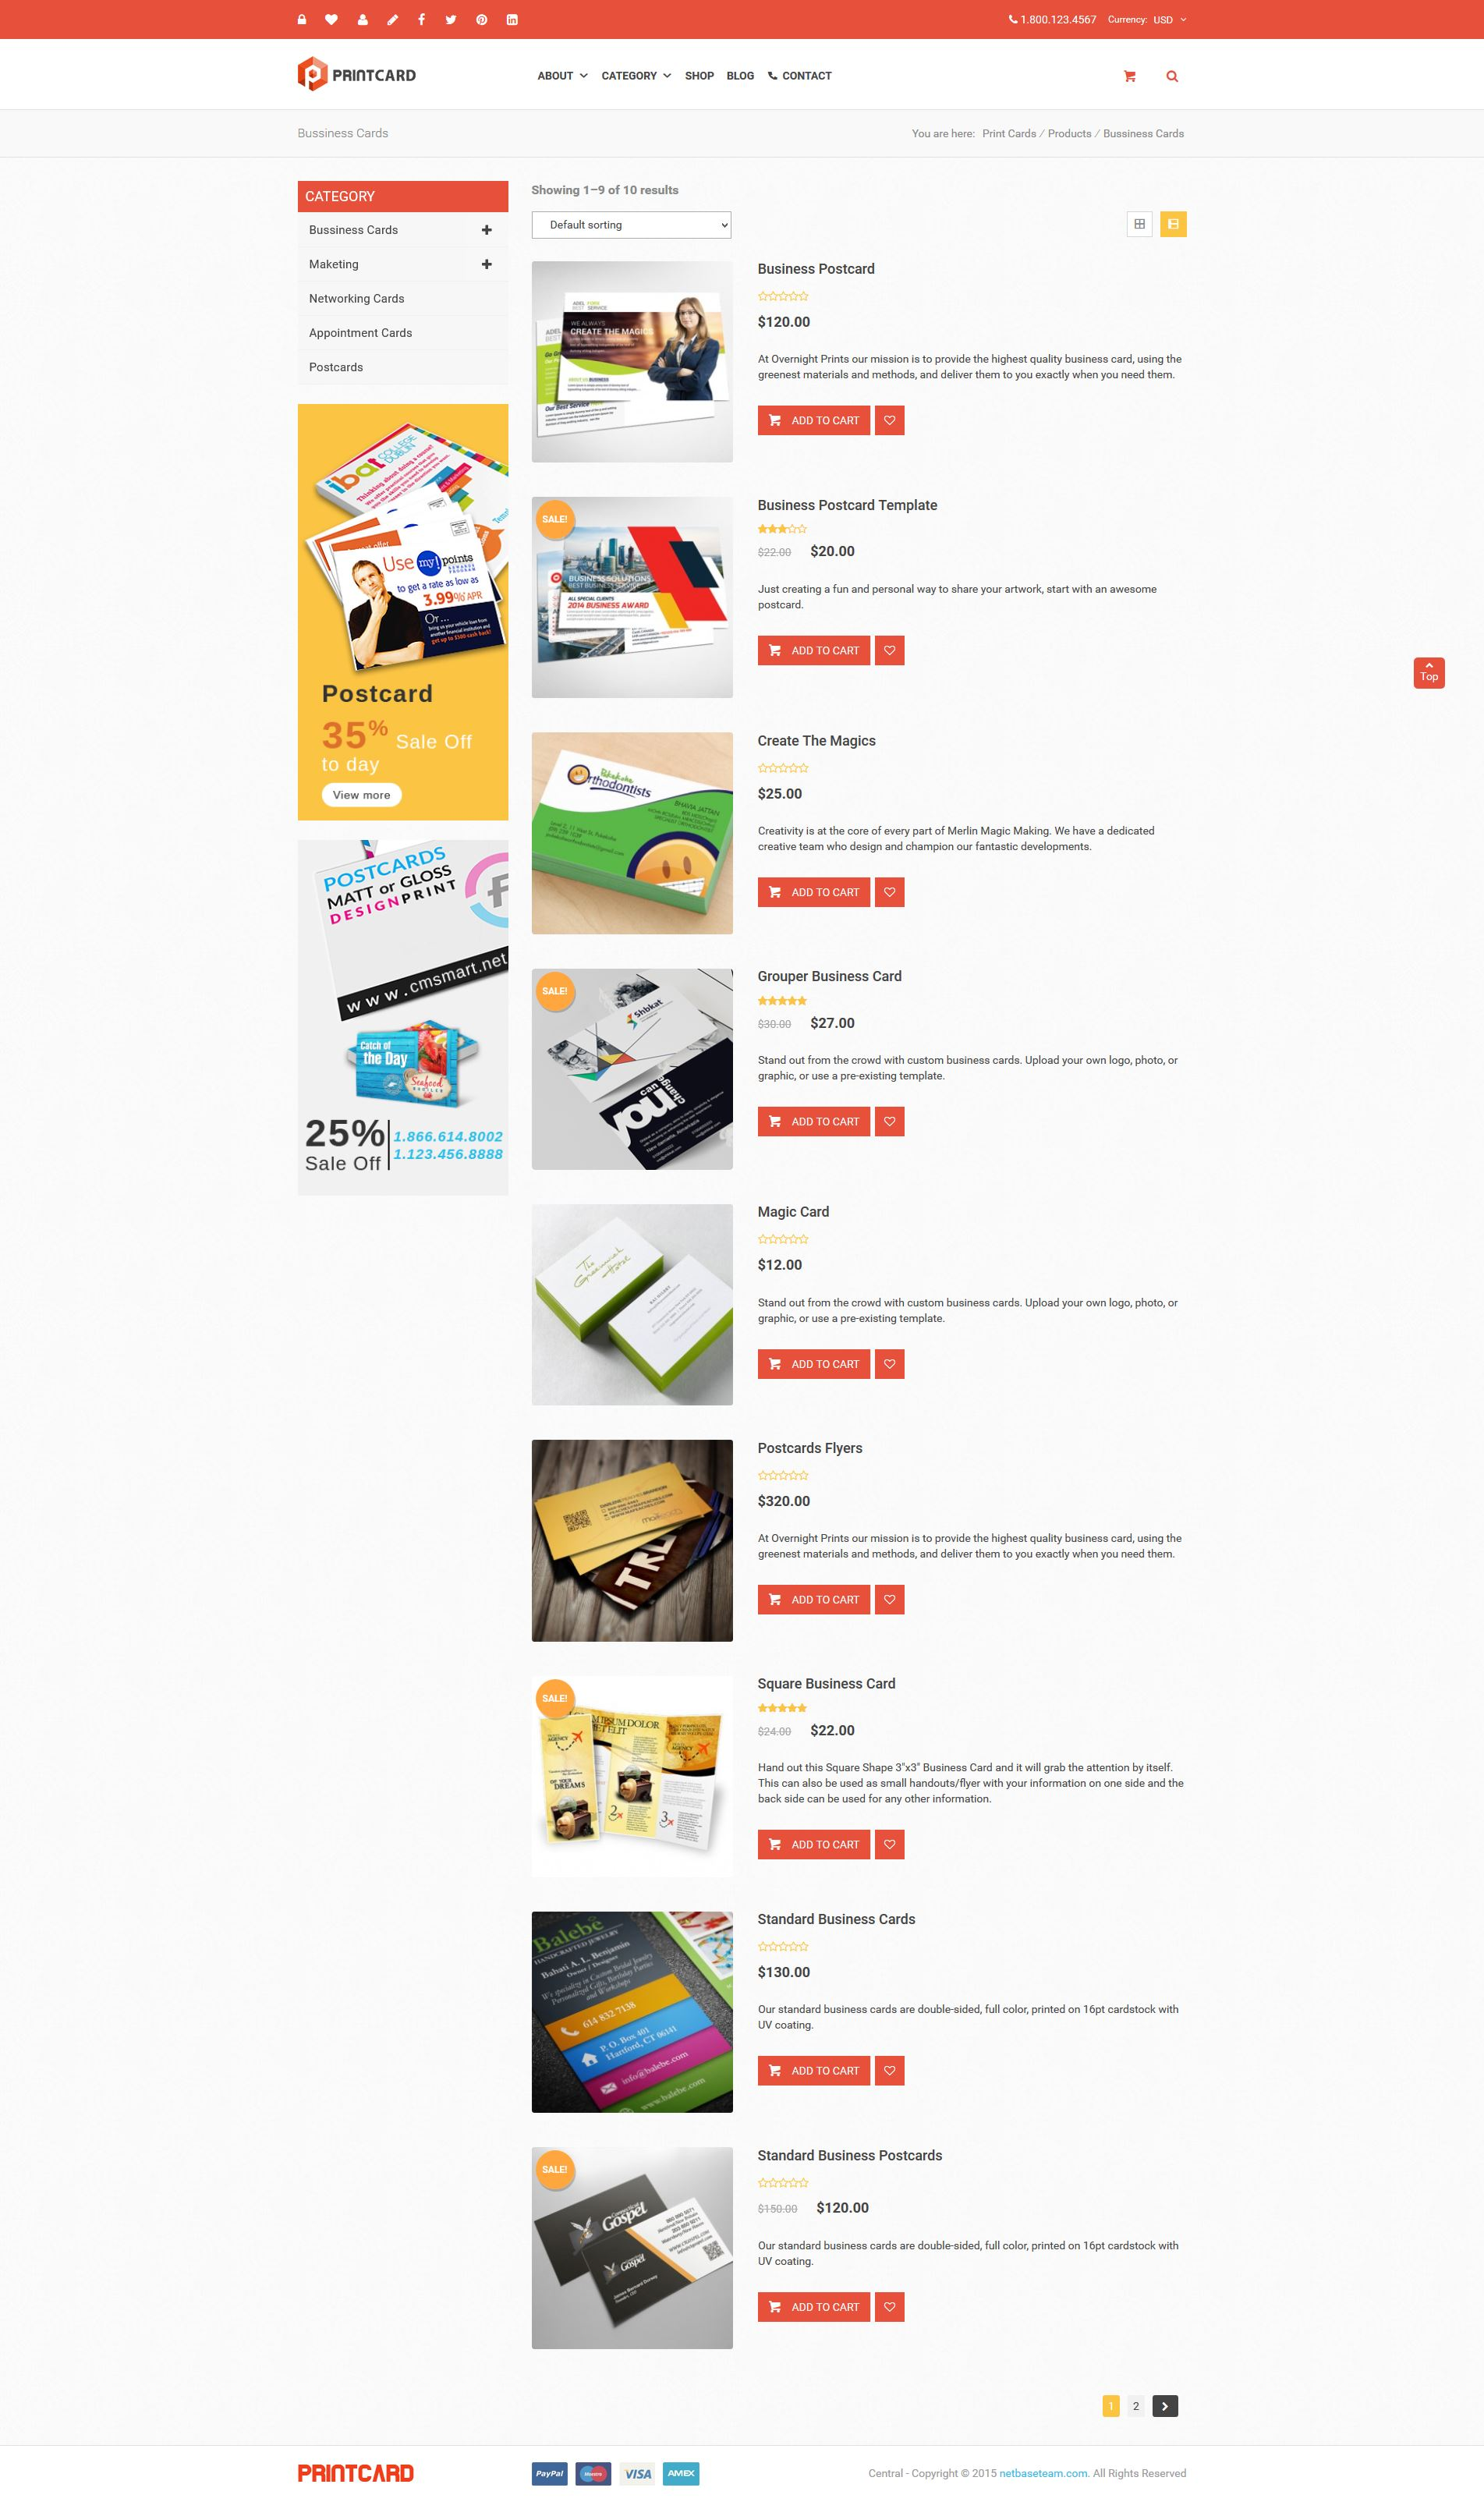 Printshop wordpress responsive printing theme by netbaseteam printshop wordpress responsive printing theme fandeluxe Gallery